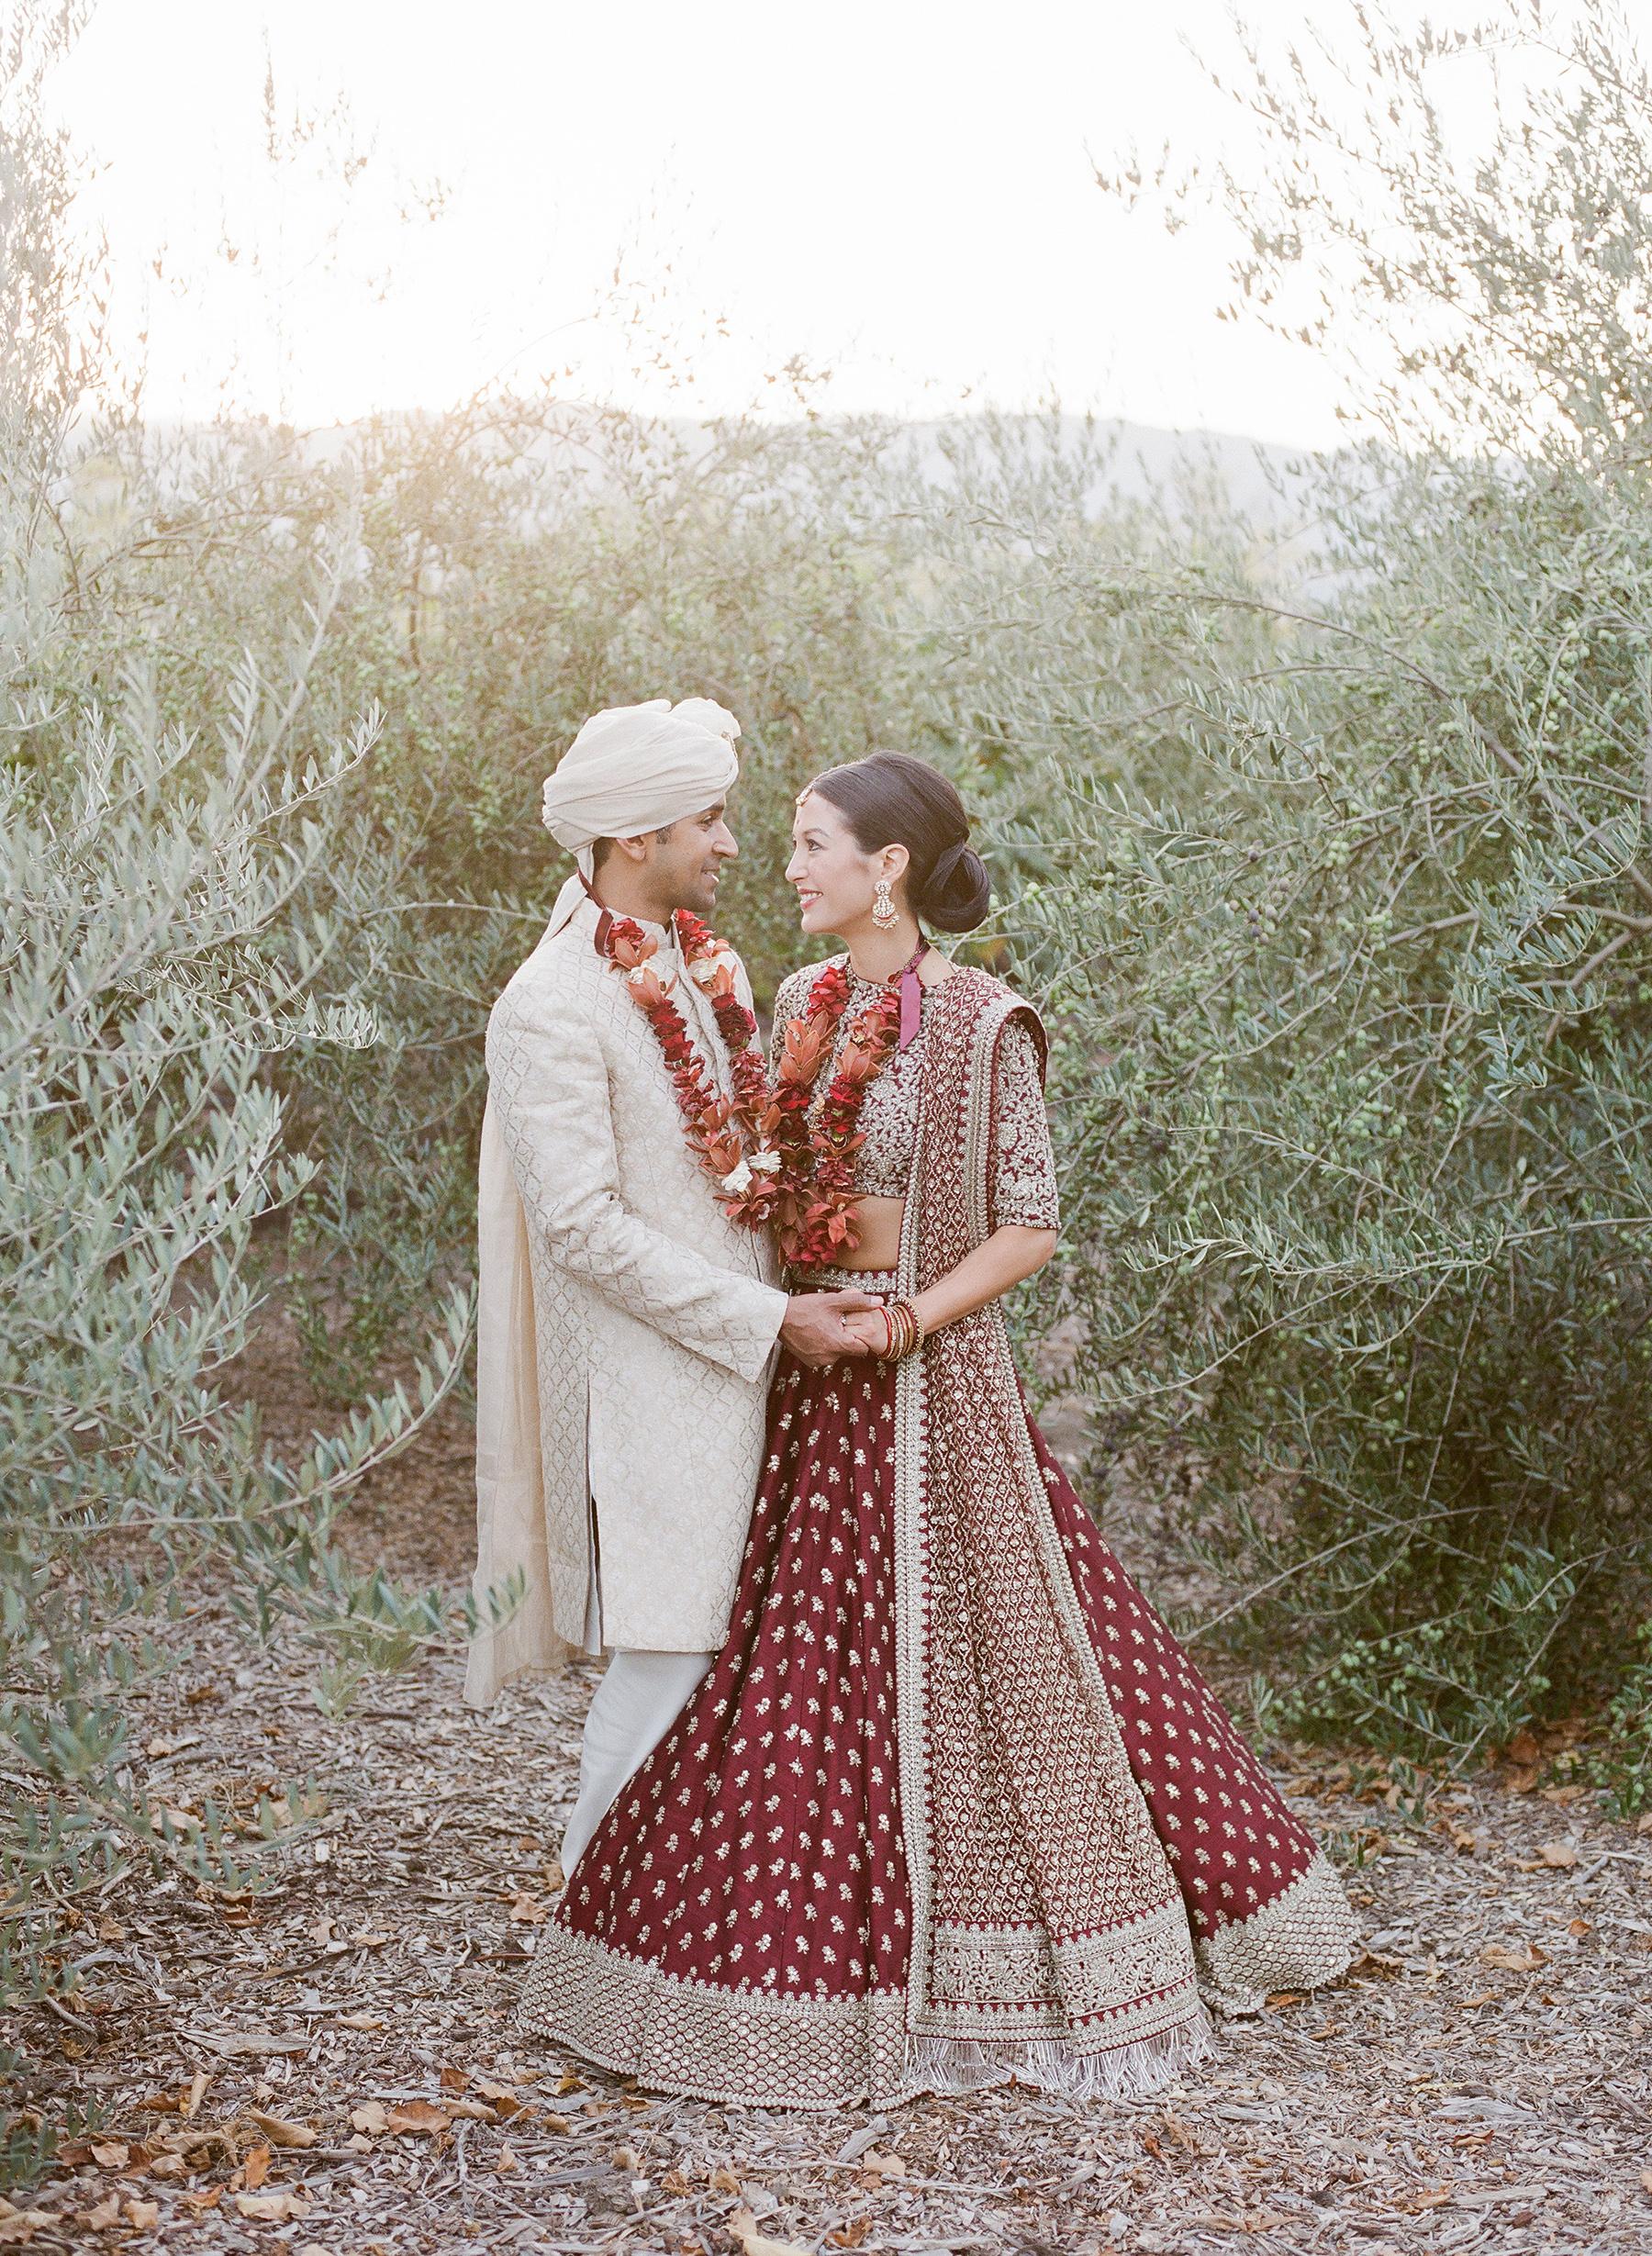 jenna alok wedding wine country california couple